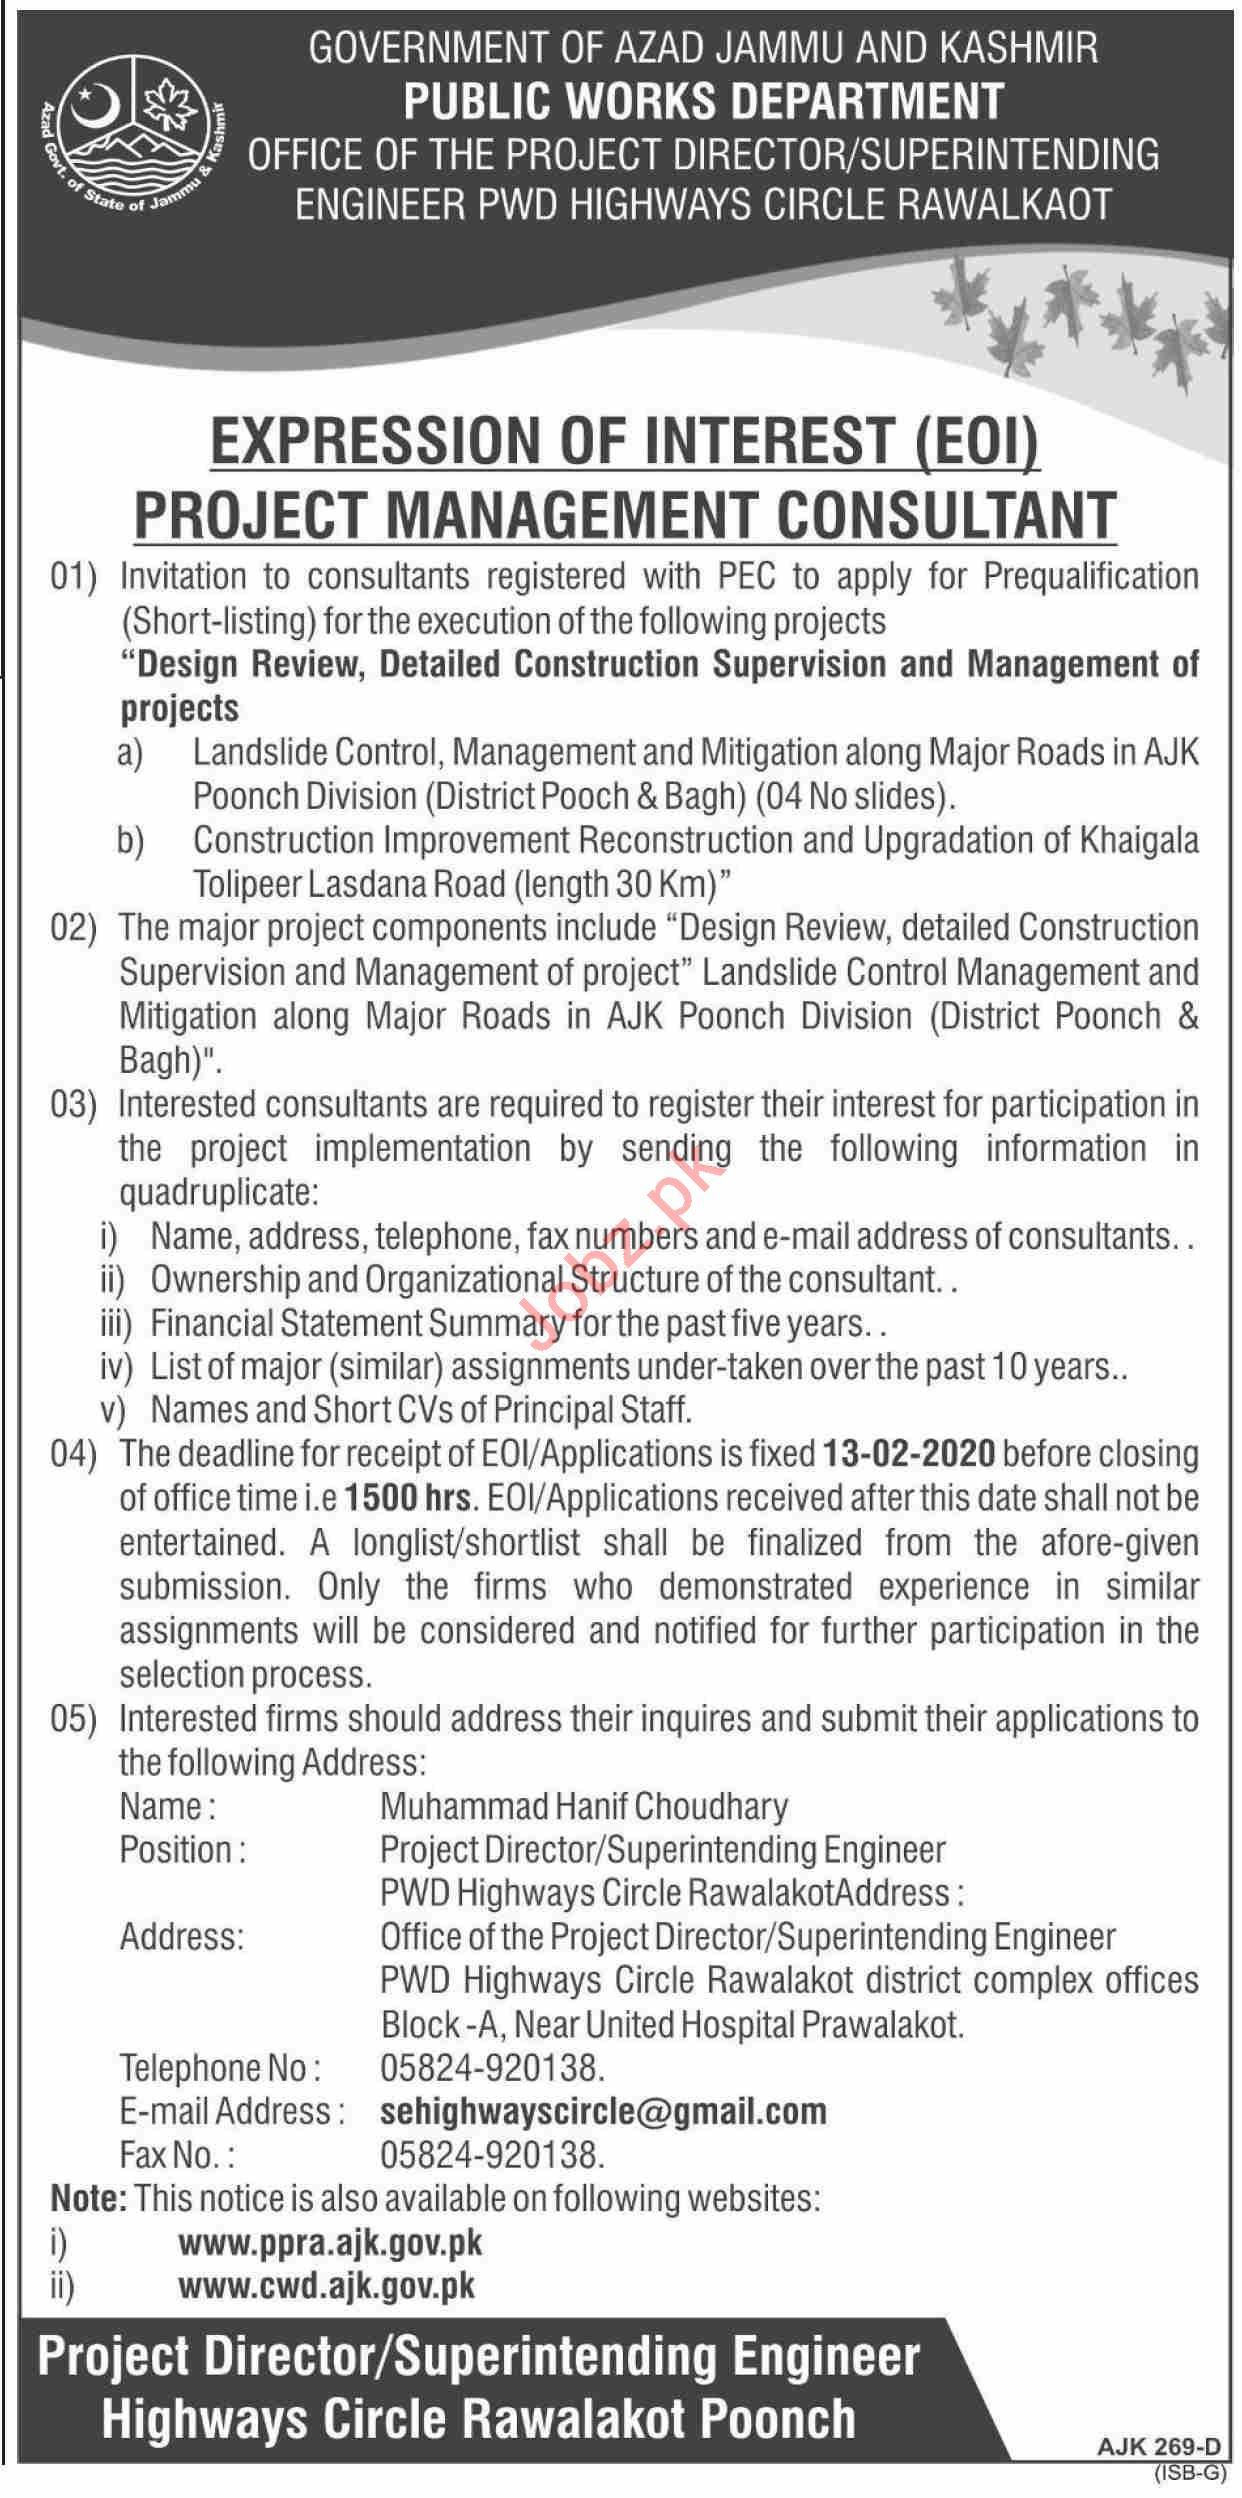 PWD Highways Circle Rawalakot Jobs 2020 for Management